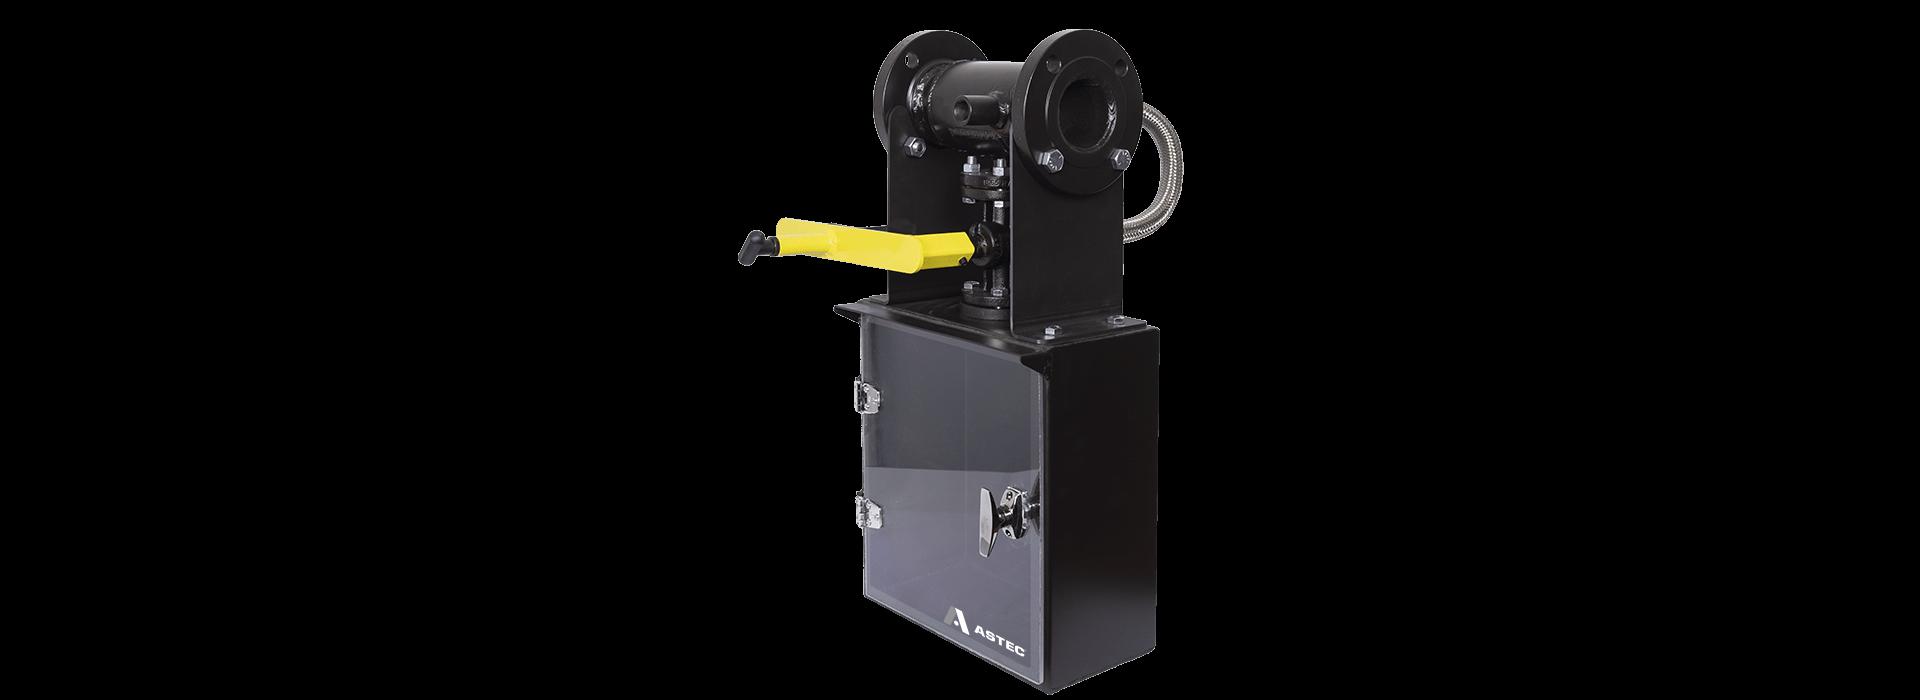 Heatec Safe Sampling System